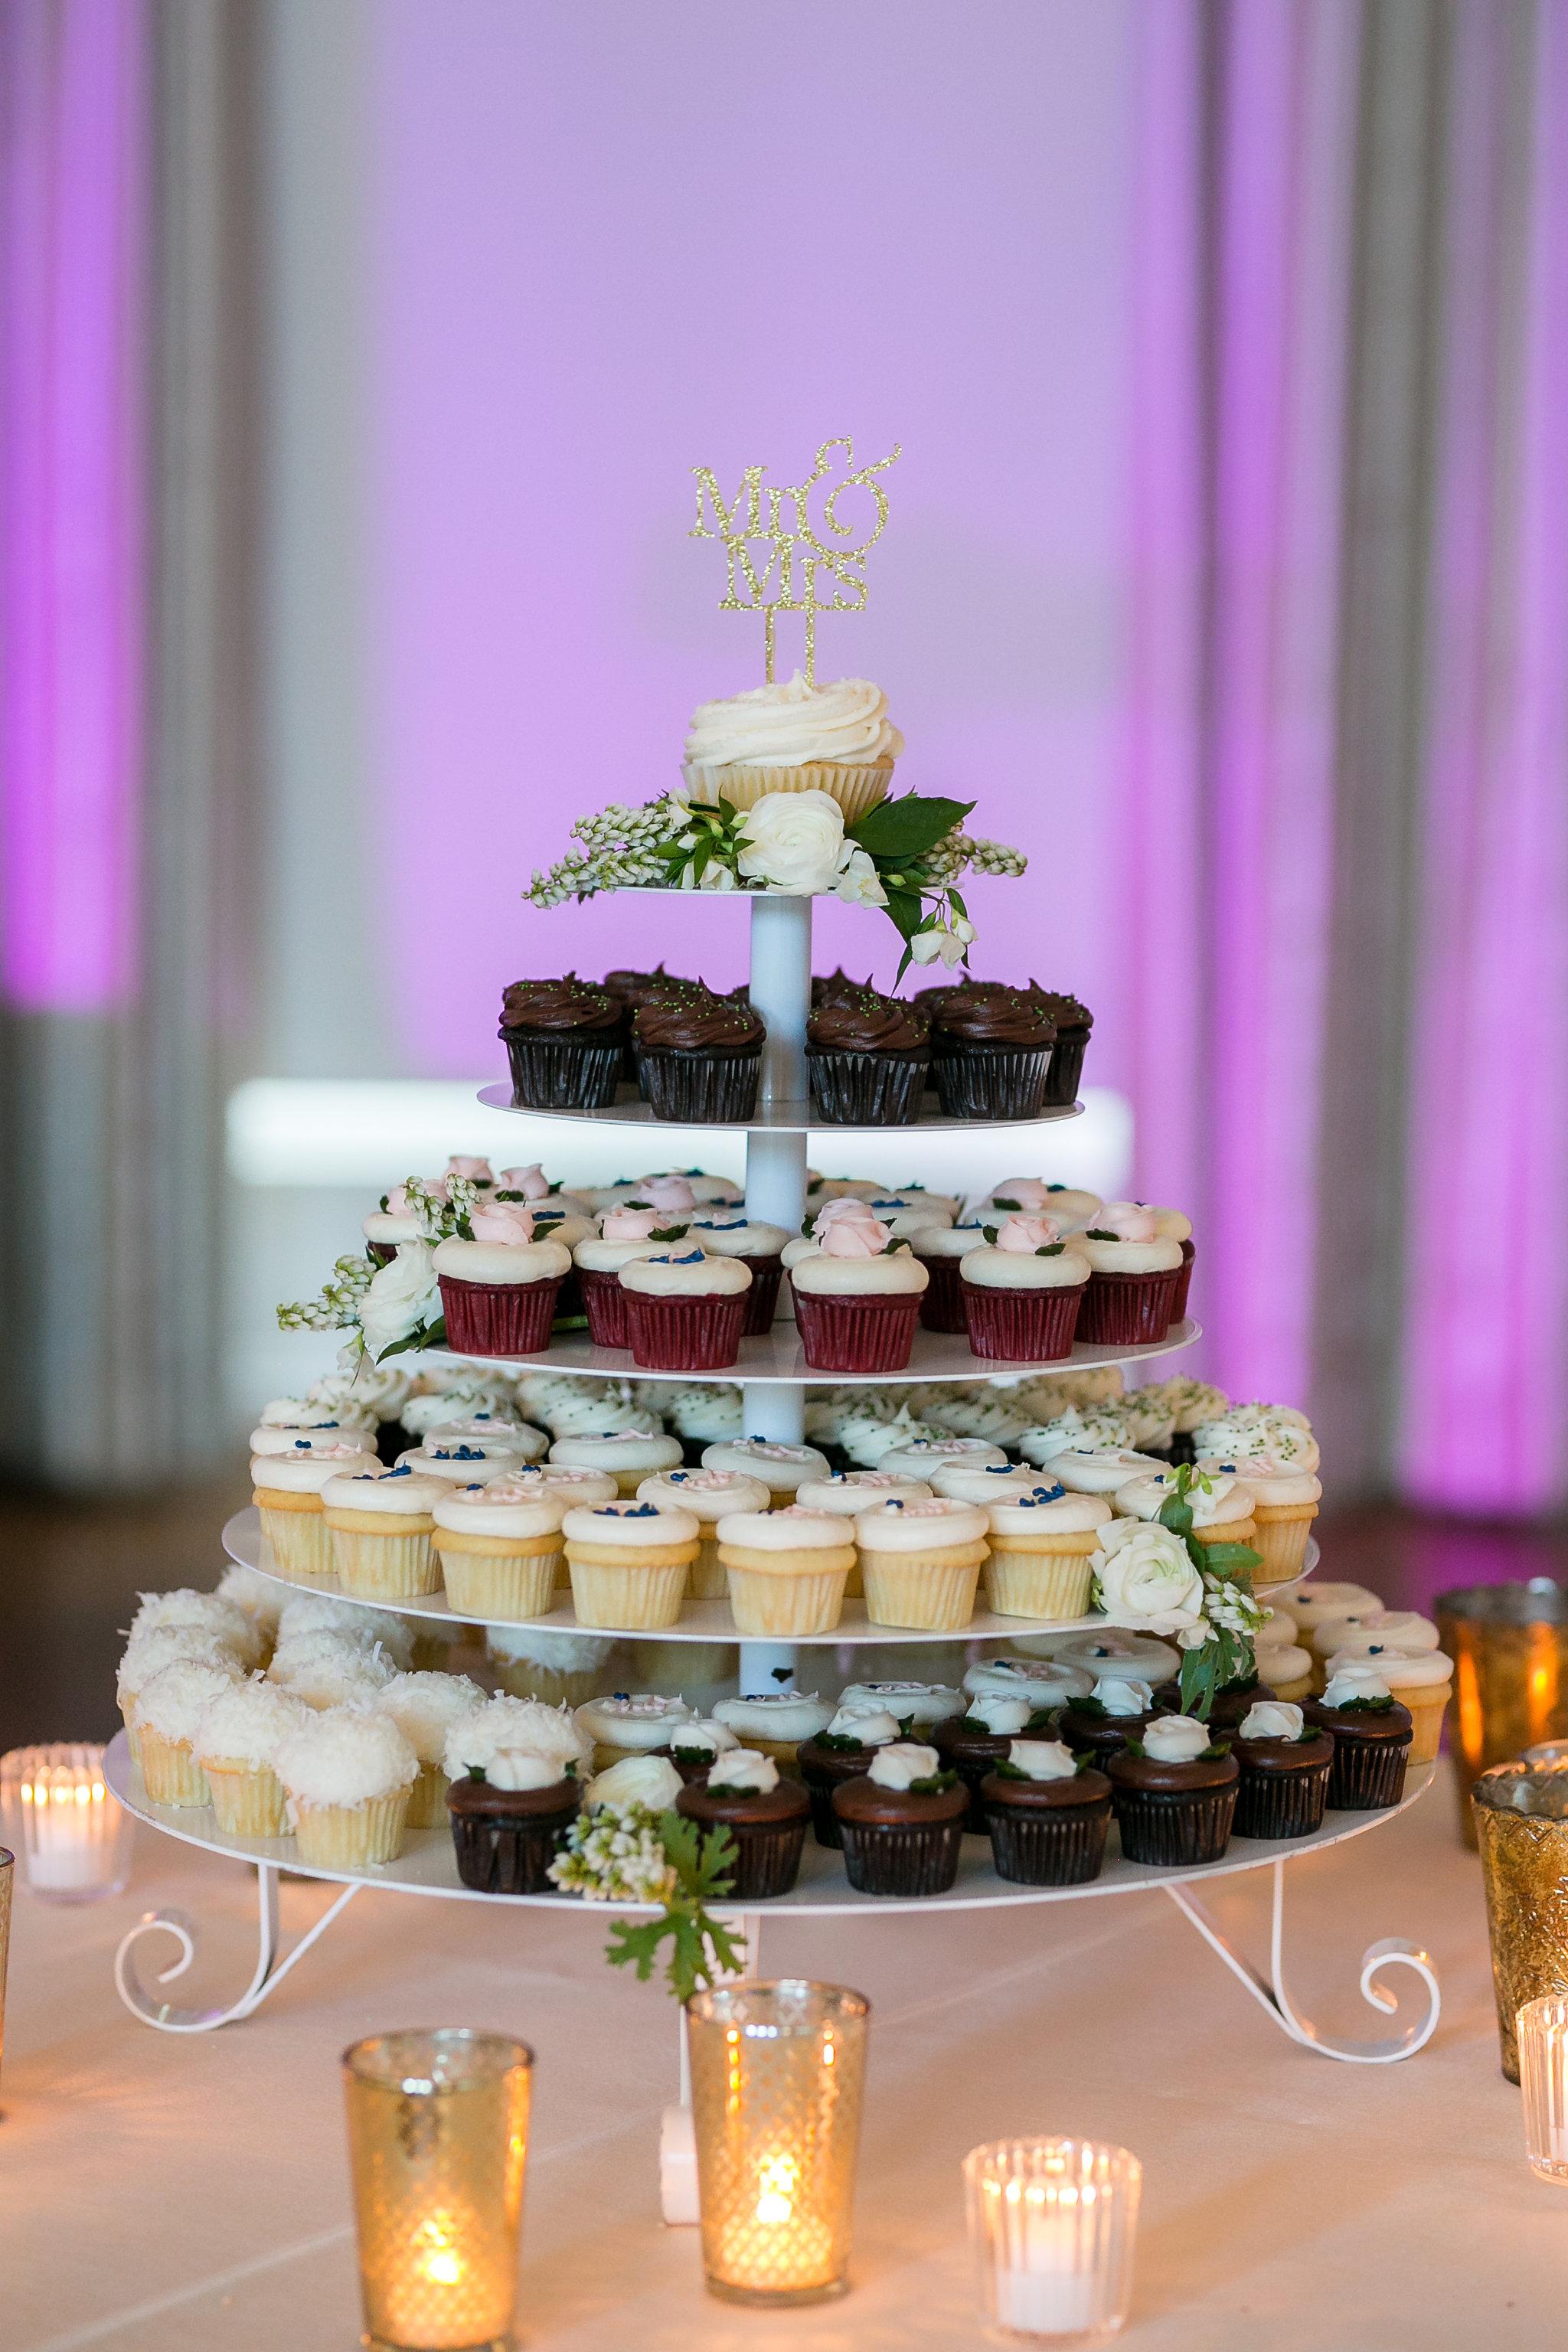 Peninsula Golf and Country Club wedding-17.jpg